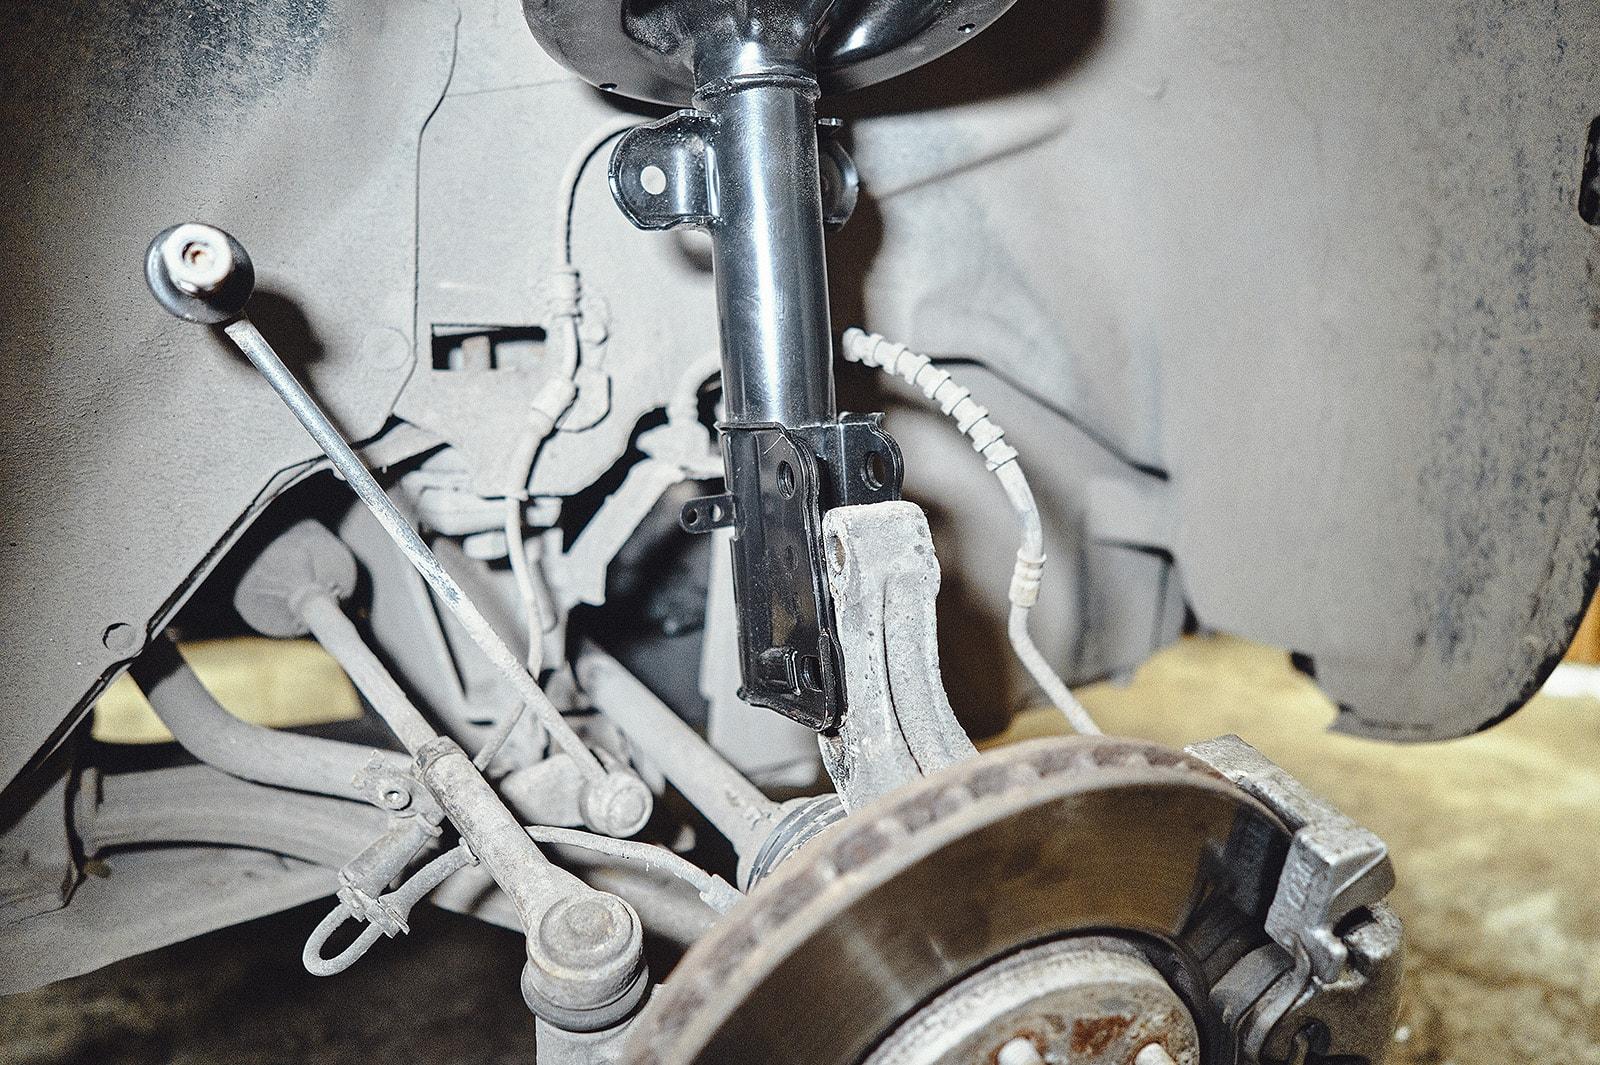 Устанавливаем на место передний амортизатор Крайслер Вояджер